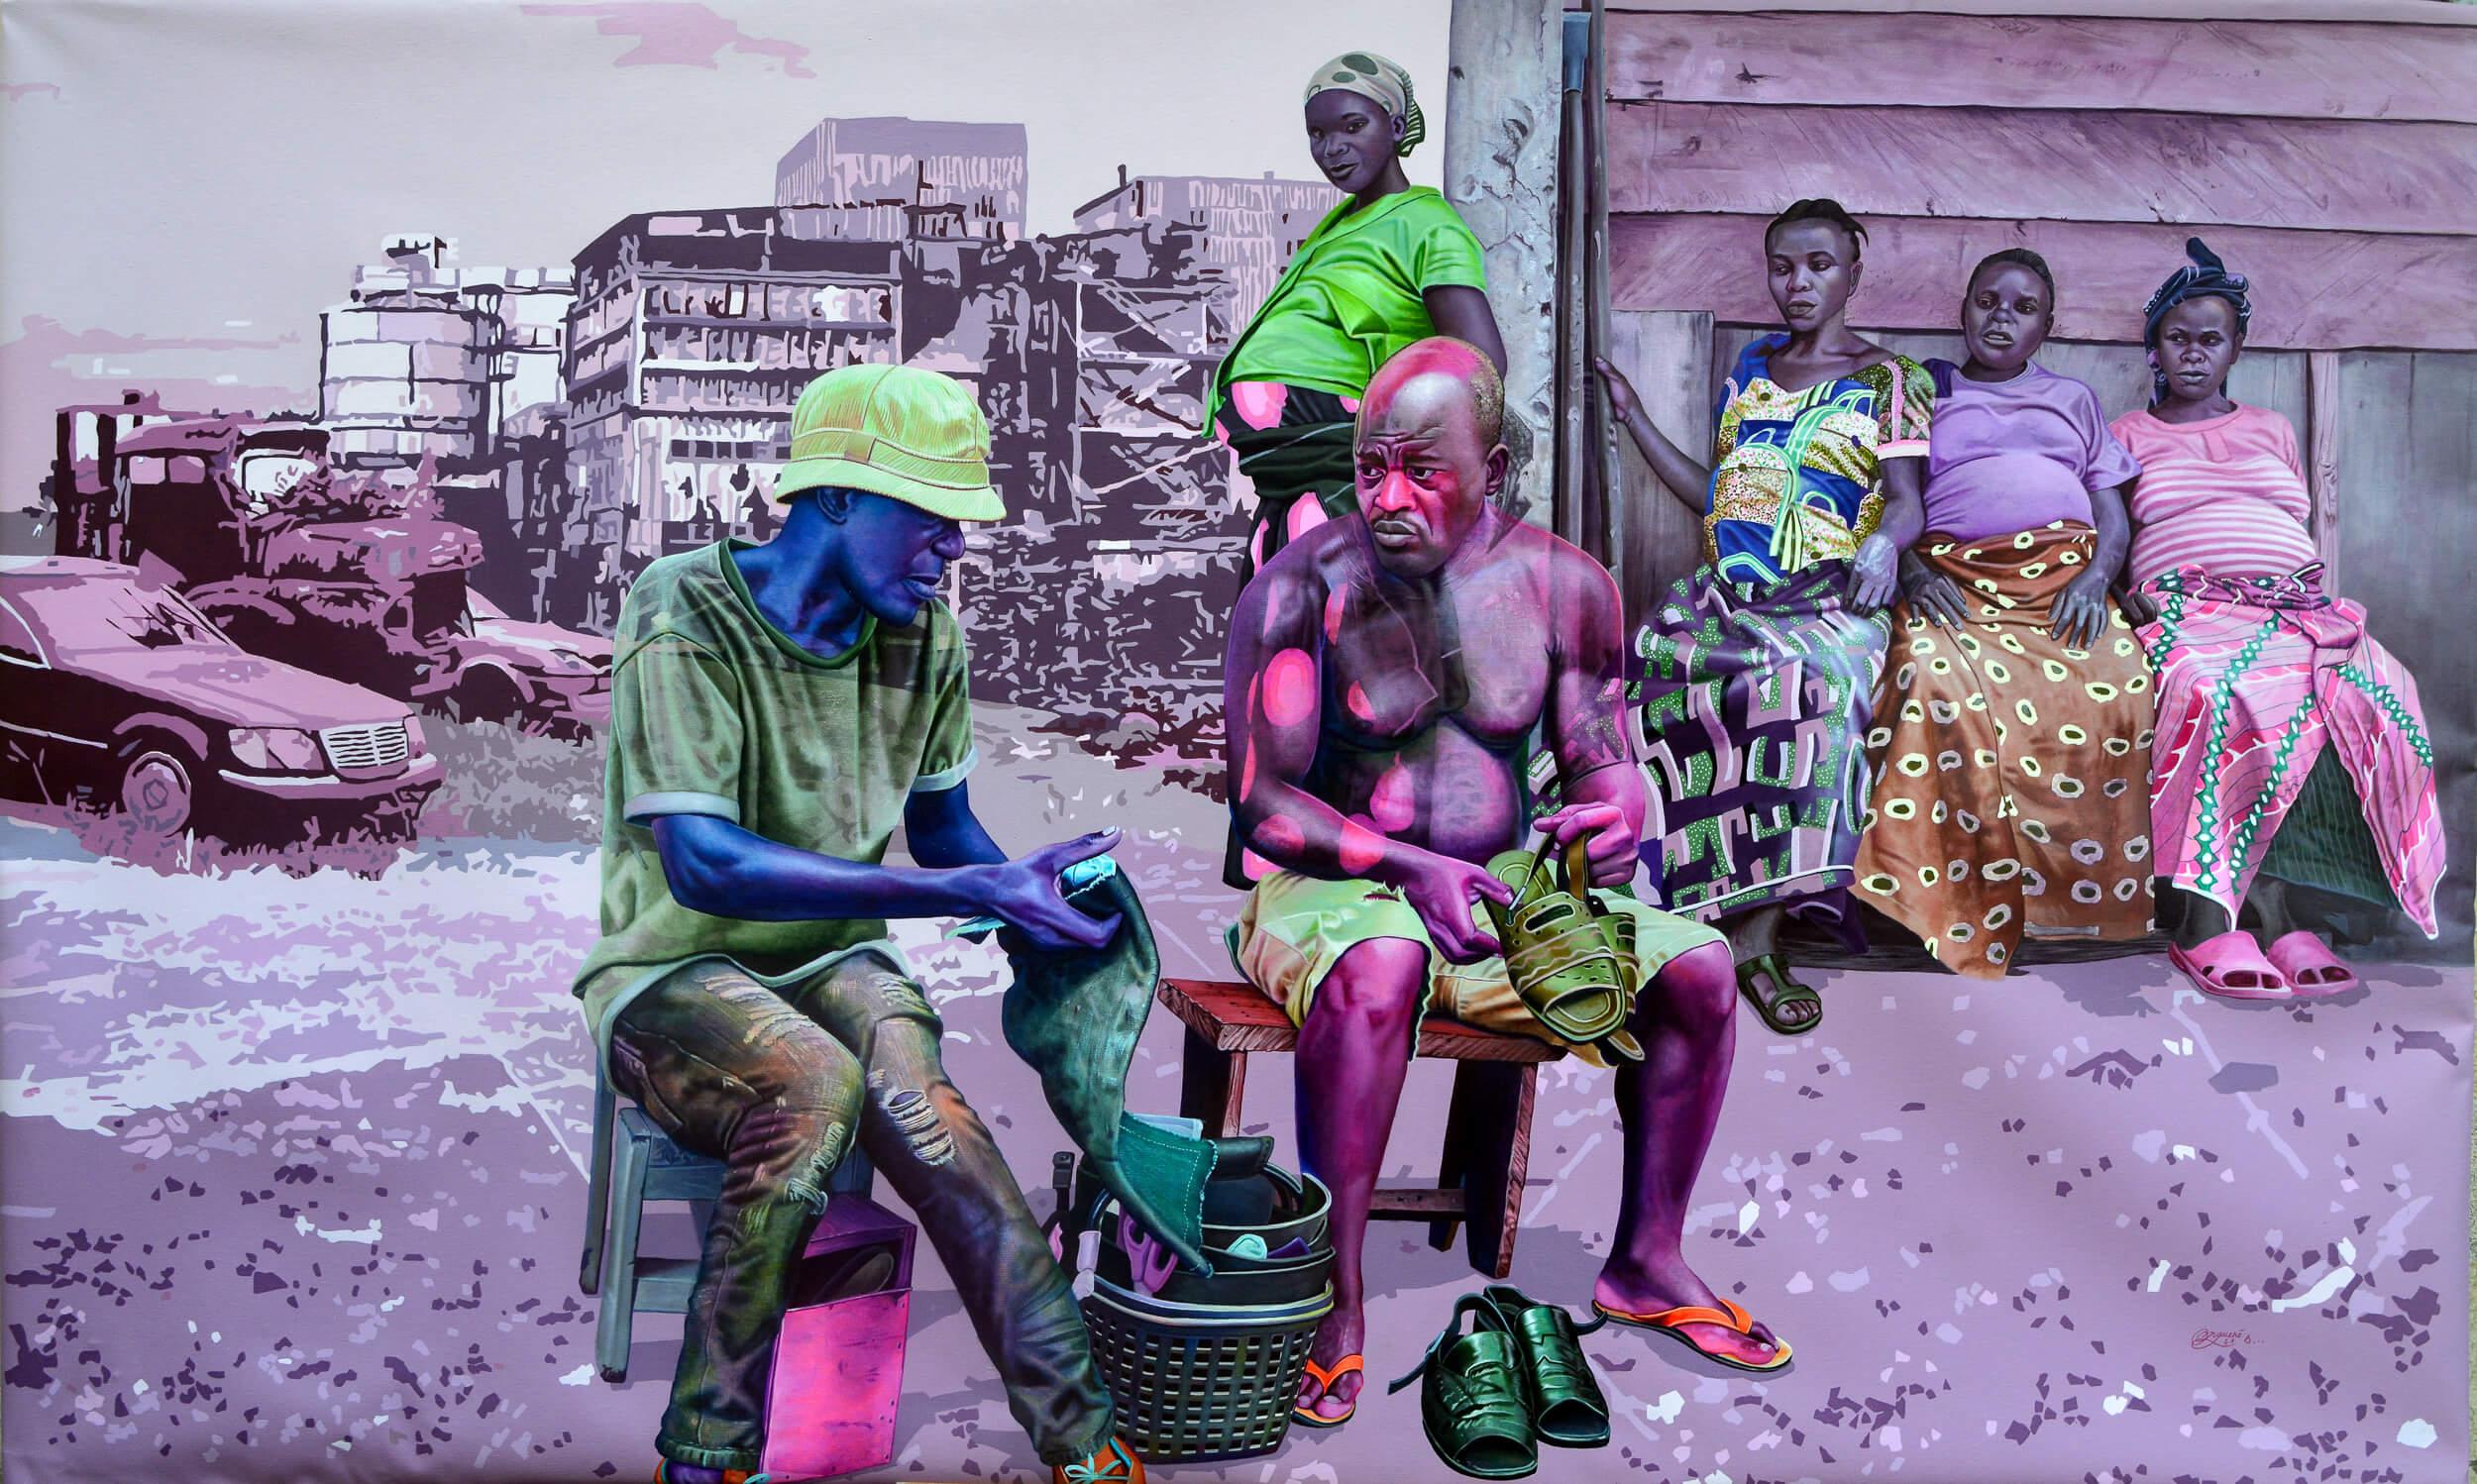 artsy-Daniel Onguene - La vie après la chute - 2021 - 120cm H x 200cm W - Acrylic on canvas -2105